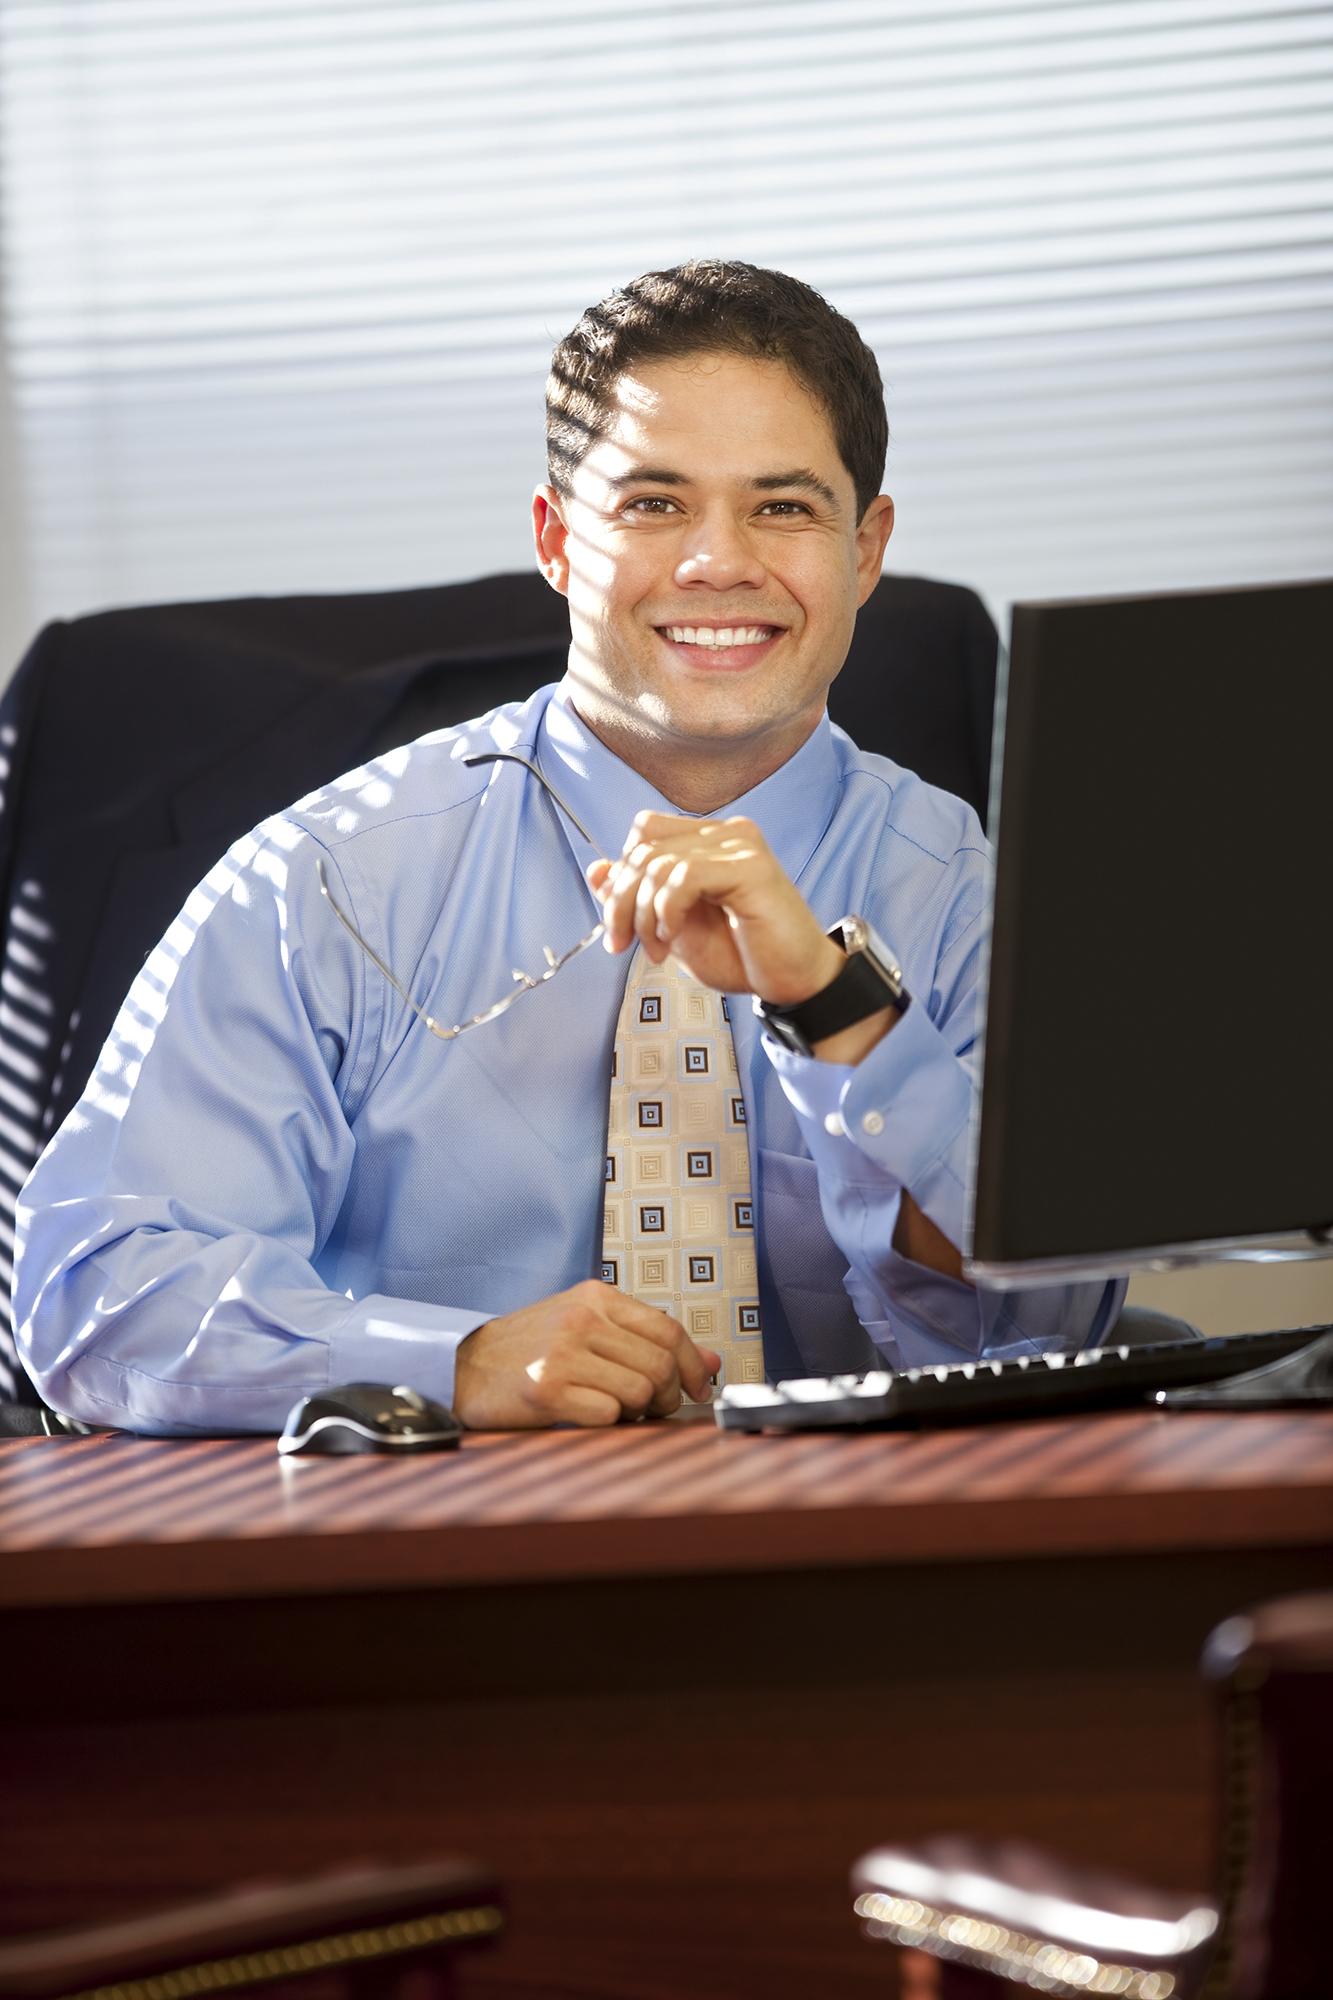 Environmental Portrait of executive